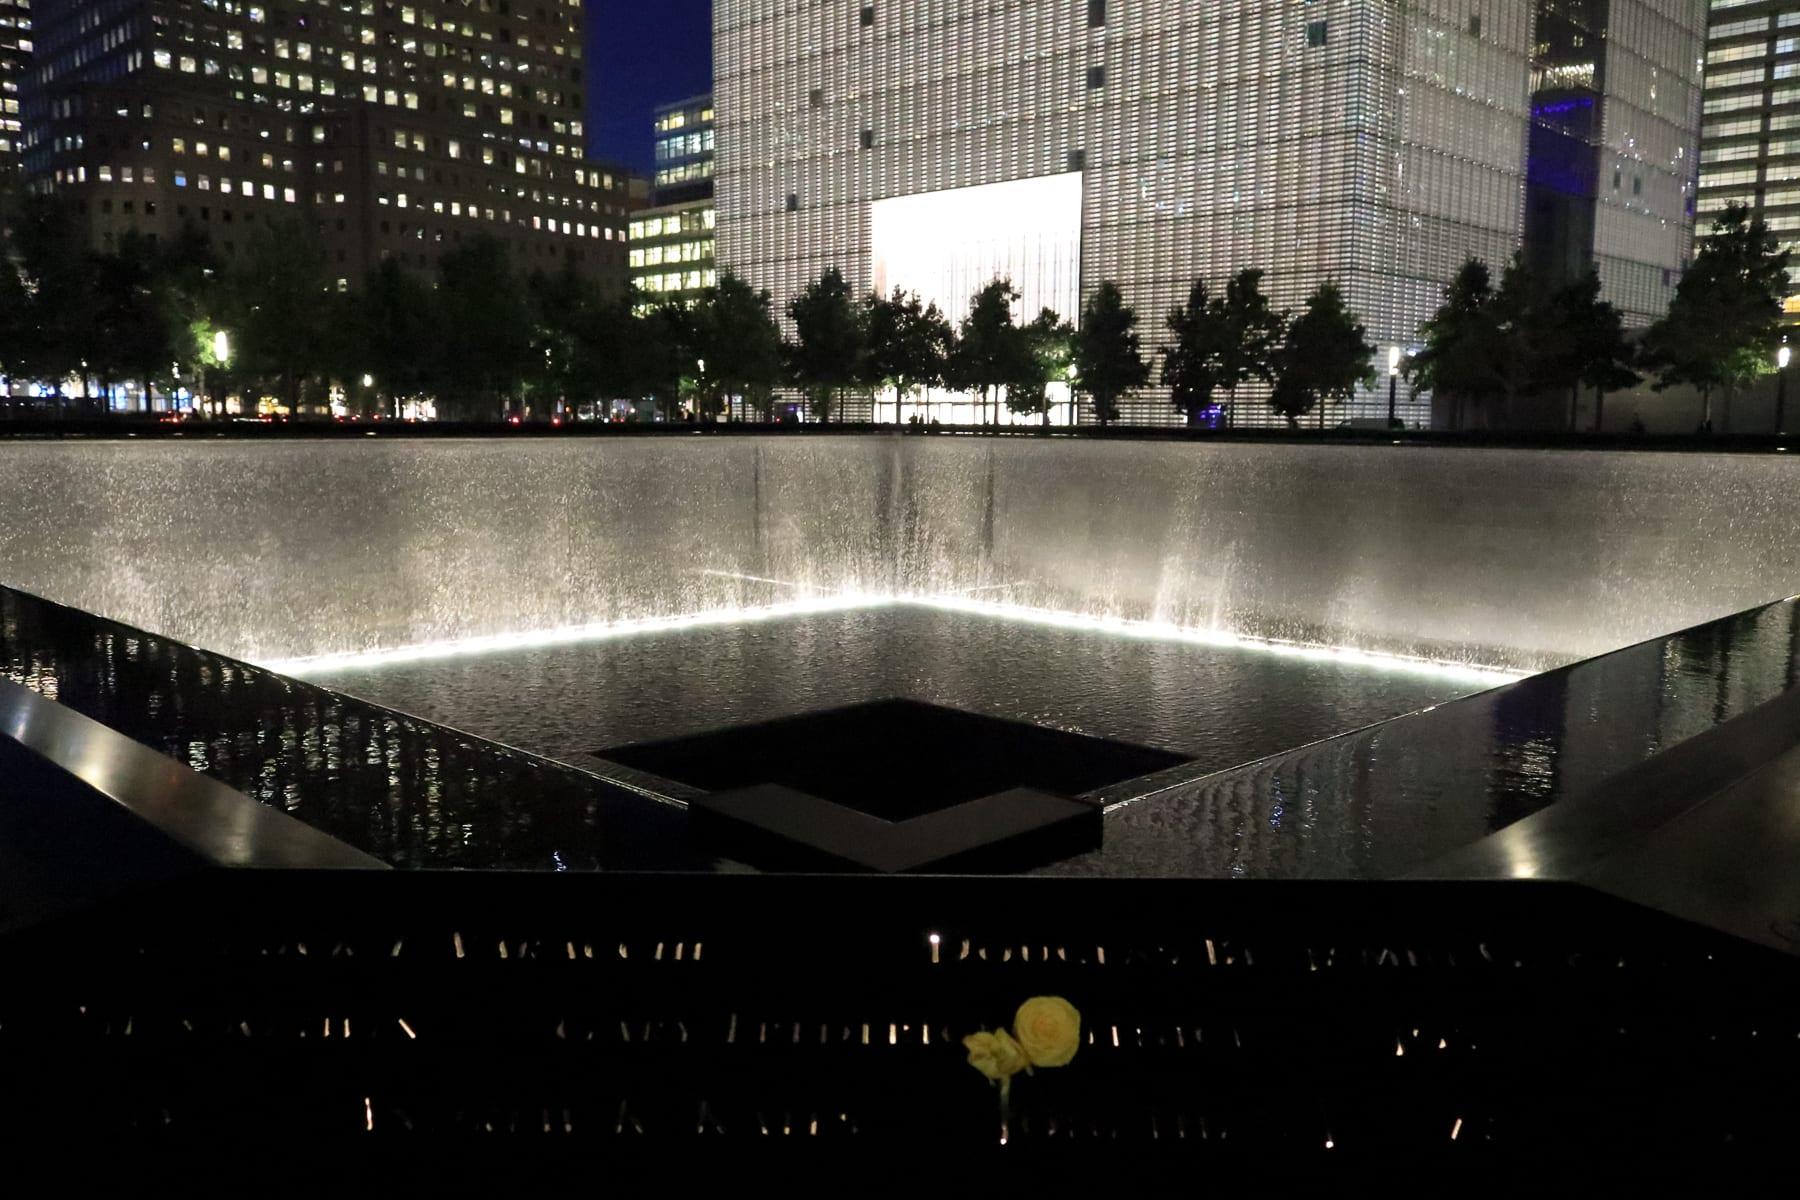 09-NY-designdays00-911memorial28.jpg